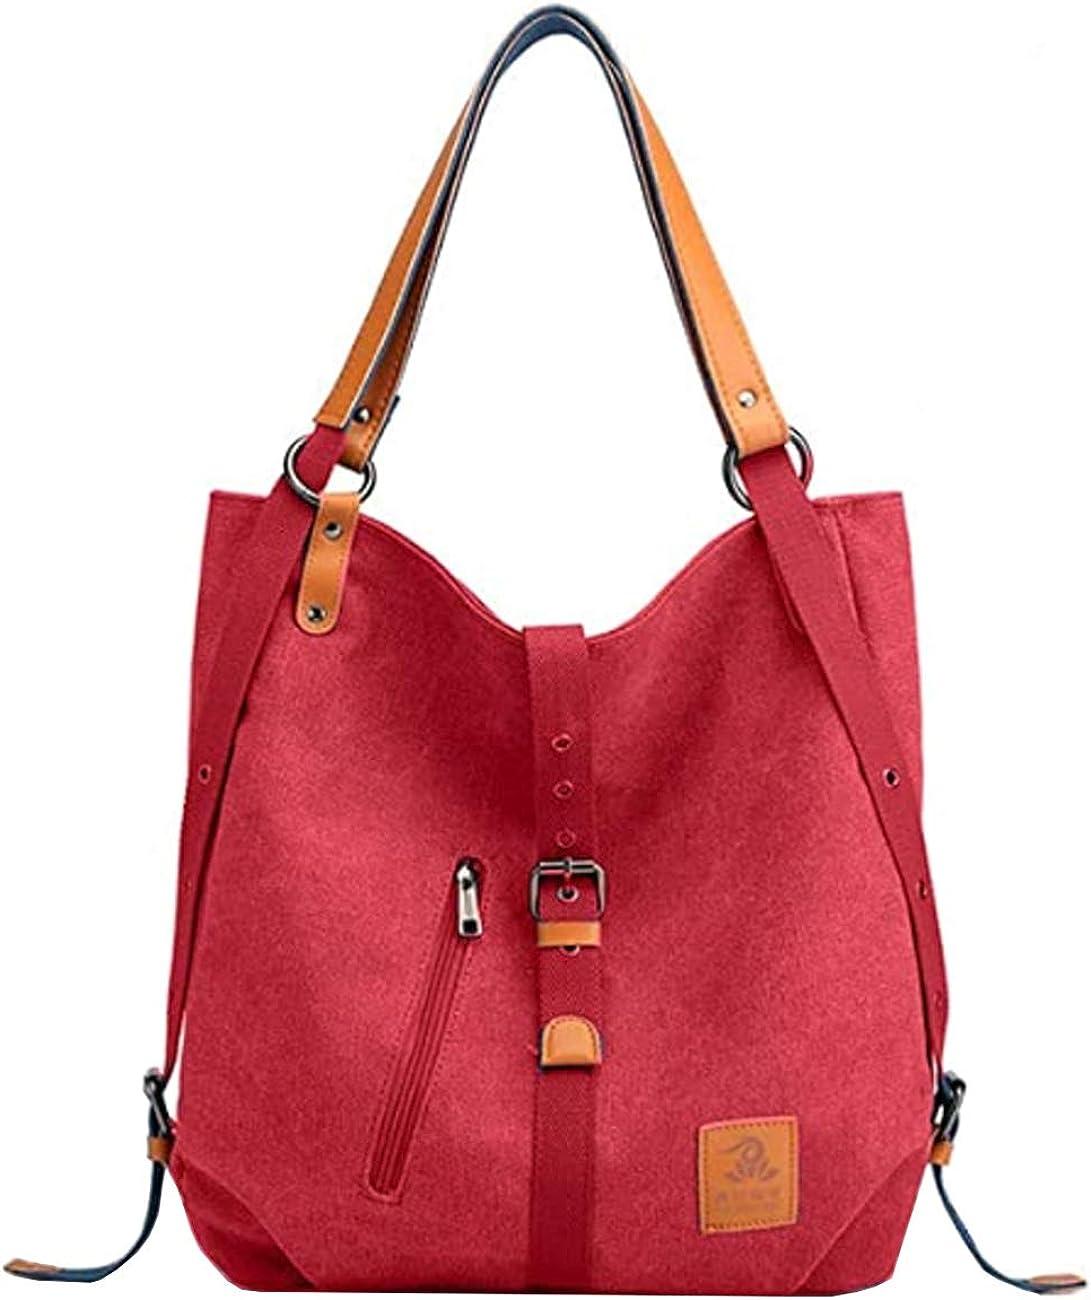 Rullar Women 3Ways Canvas Animer and price revision Purses Bac Handbags Max 40% OFF Totes Shoulder Bag